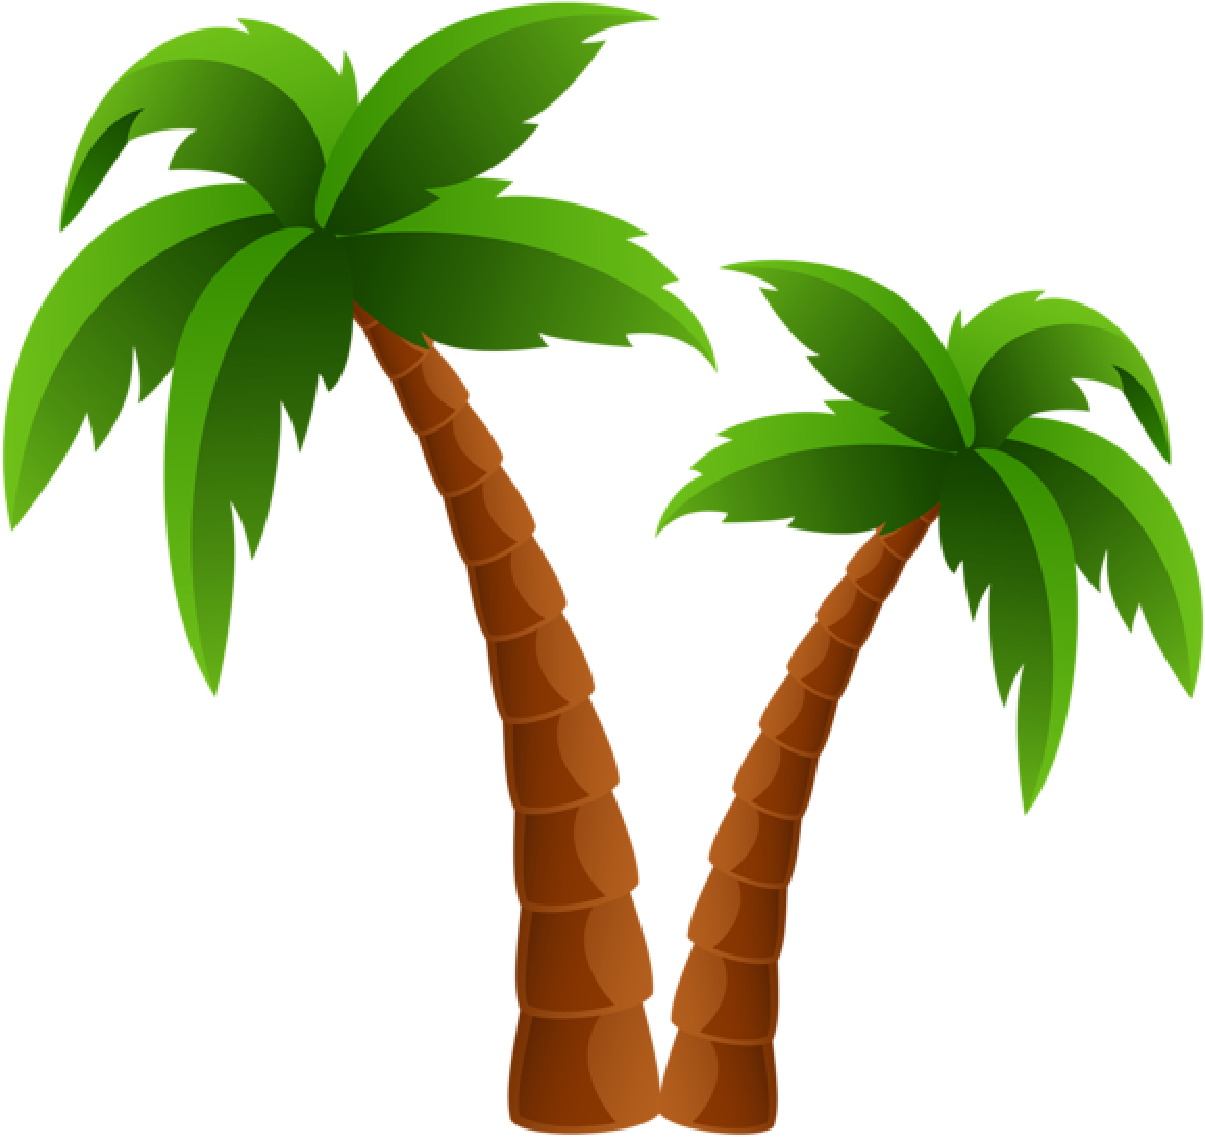 Transparent tree clip art - Palm Tree Clip Art And Cartoons On Palm Trees - Palm Tree Clipart Transparent Background